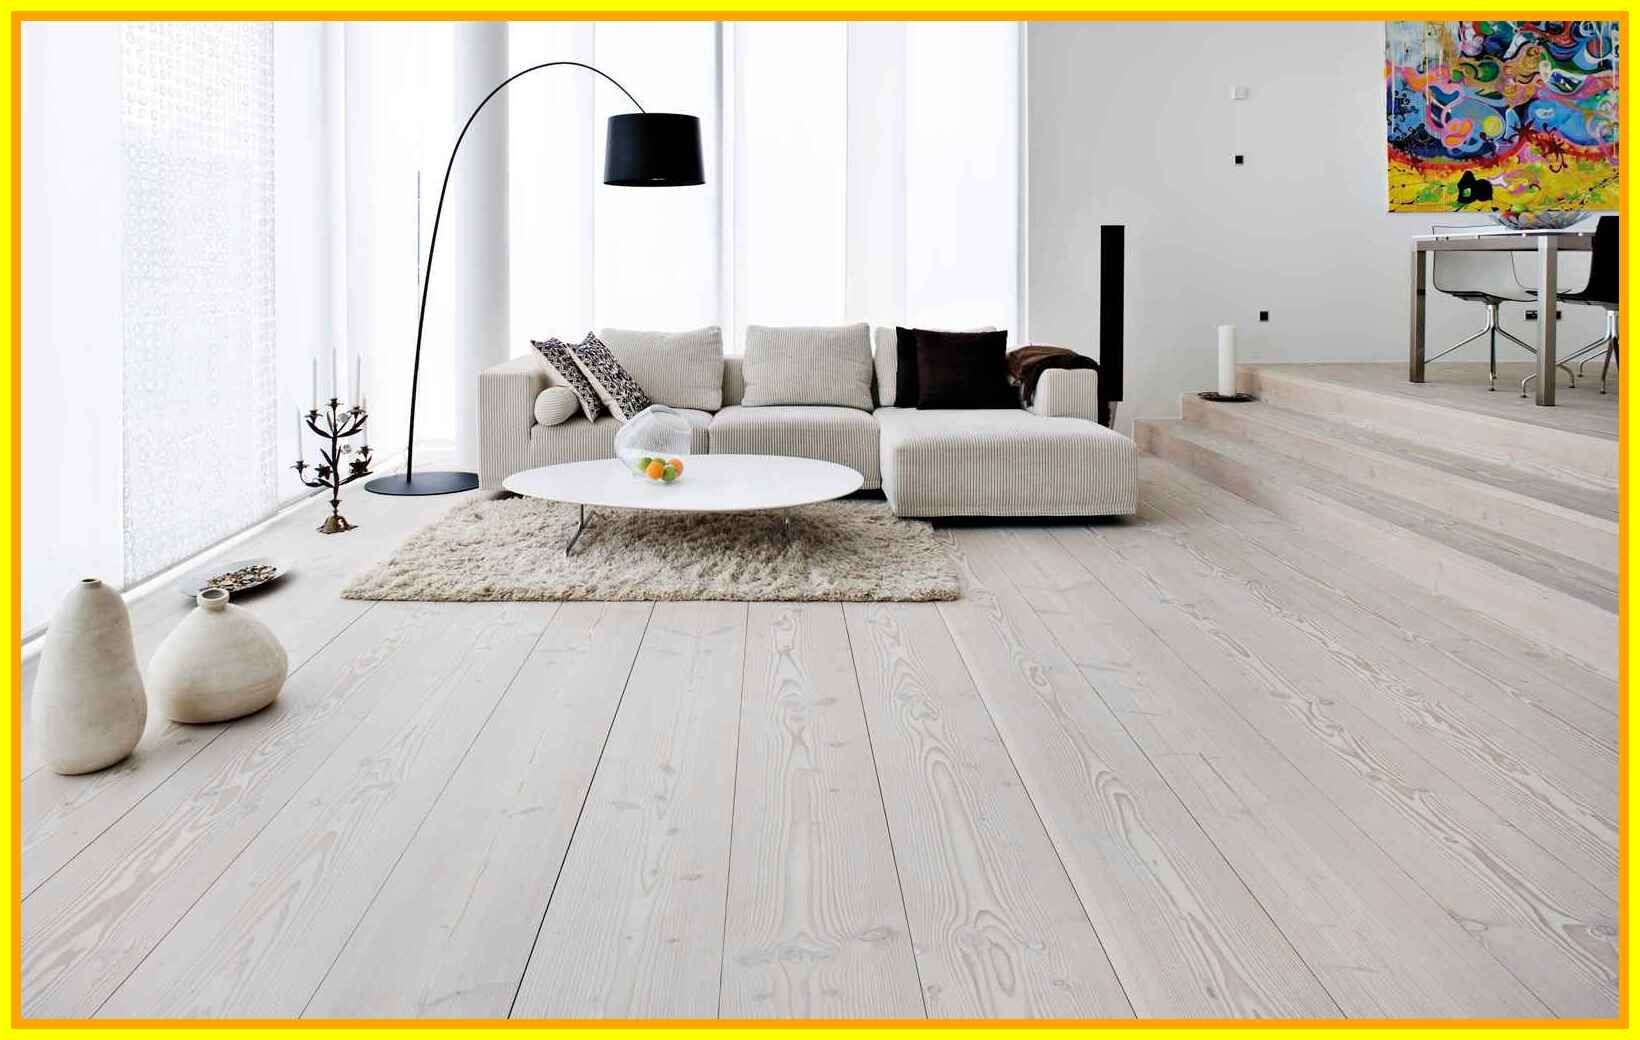 38 Reference Of Flooring Ideas Inexpensive Laminate Flooring In 2020 Living Room Wood Floor White Wood Floors Grey Wood Floors Living Room